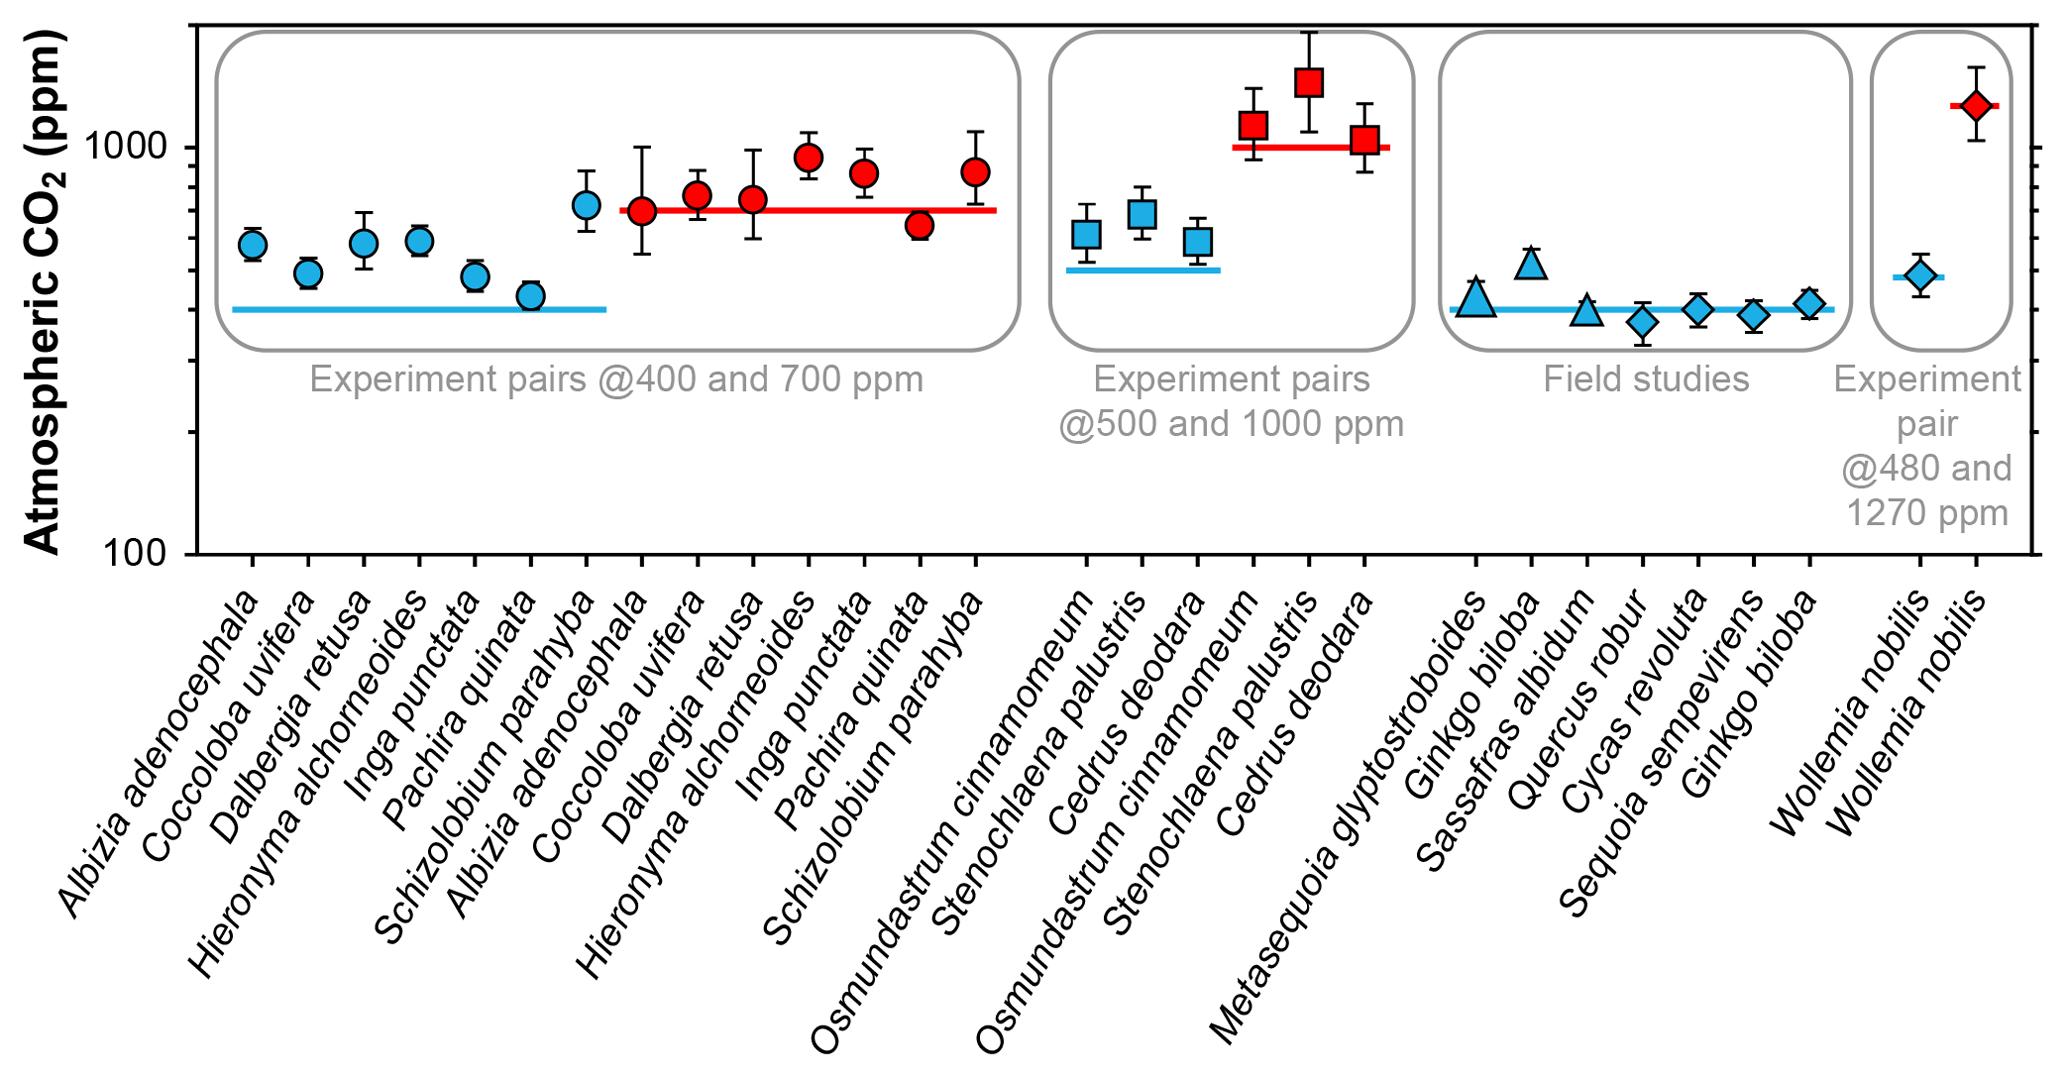 CP - Sensitivity of a leaf gas-exchange model for estimating